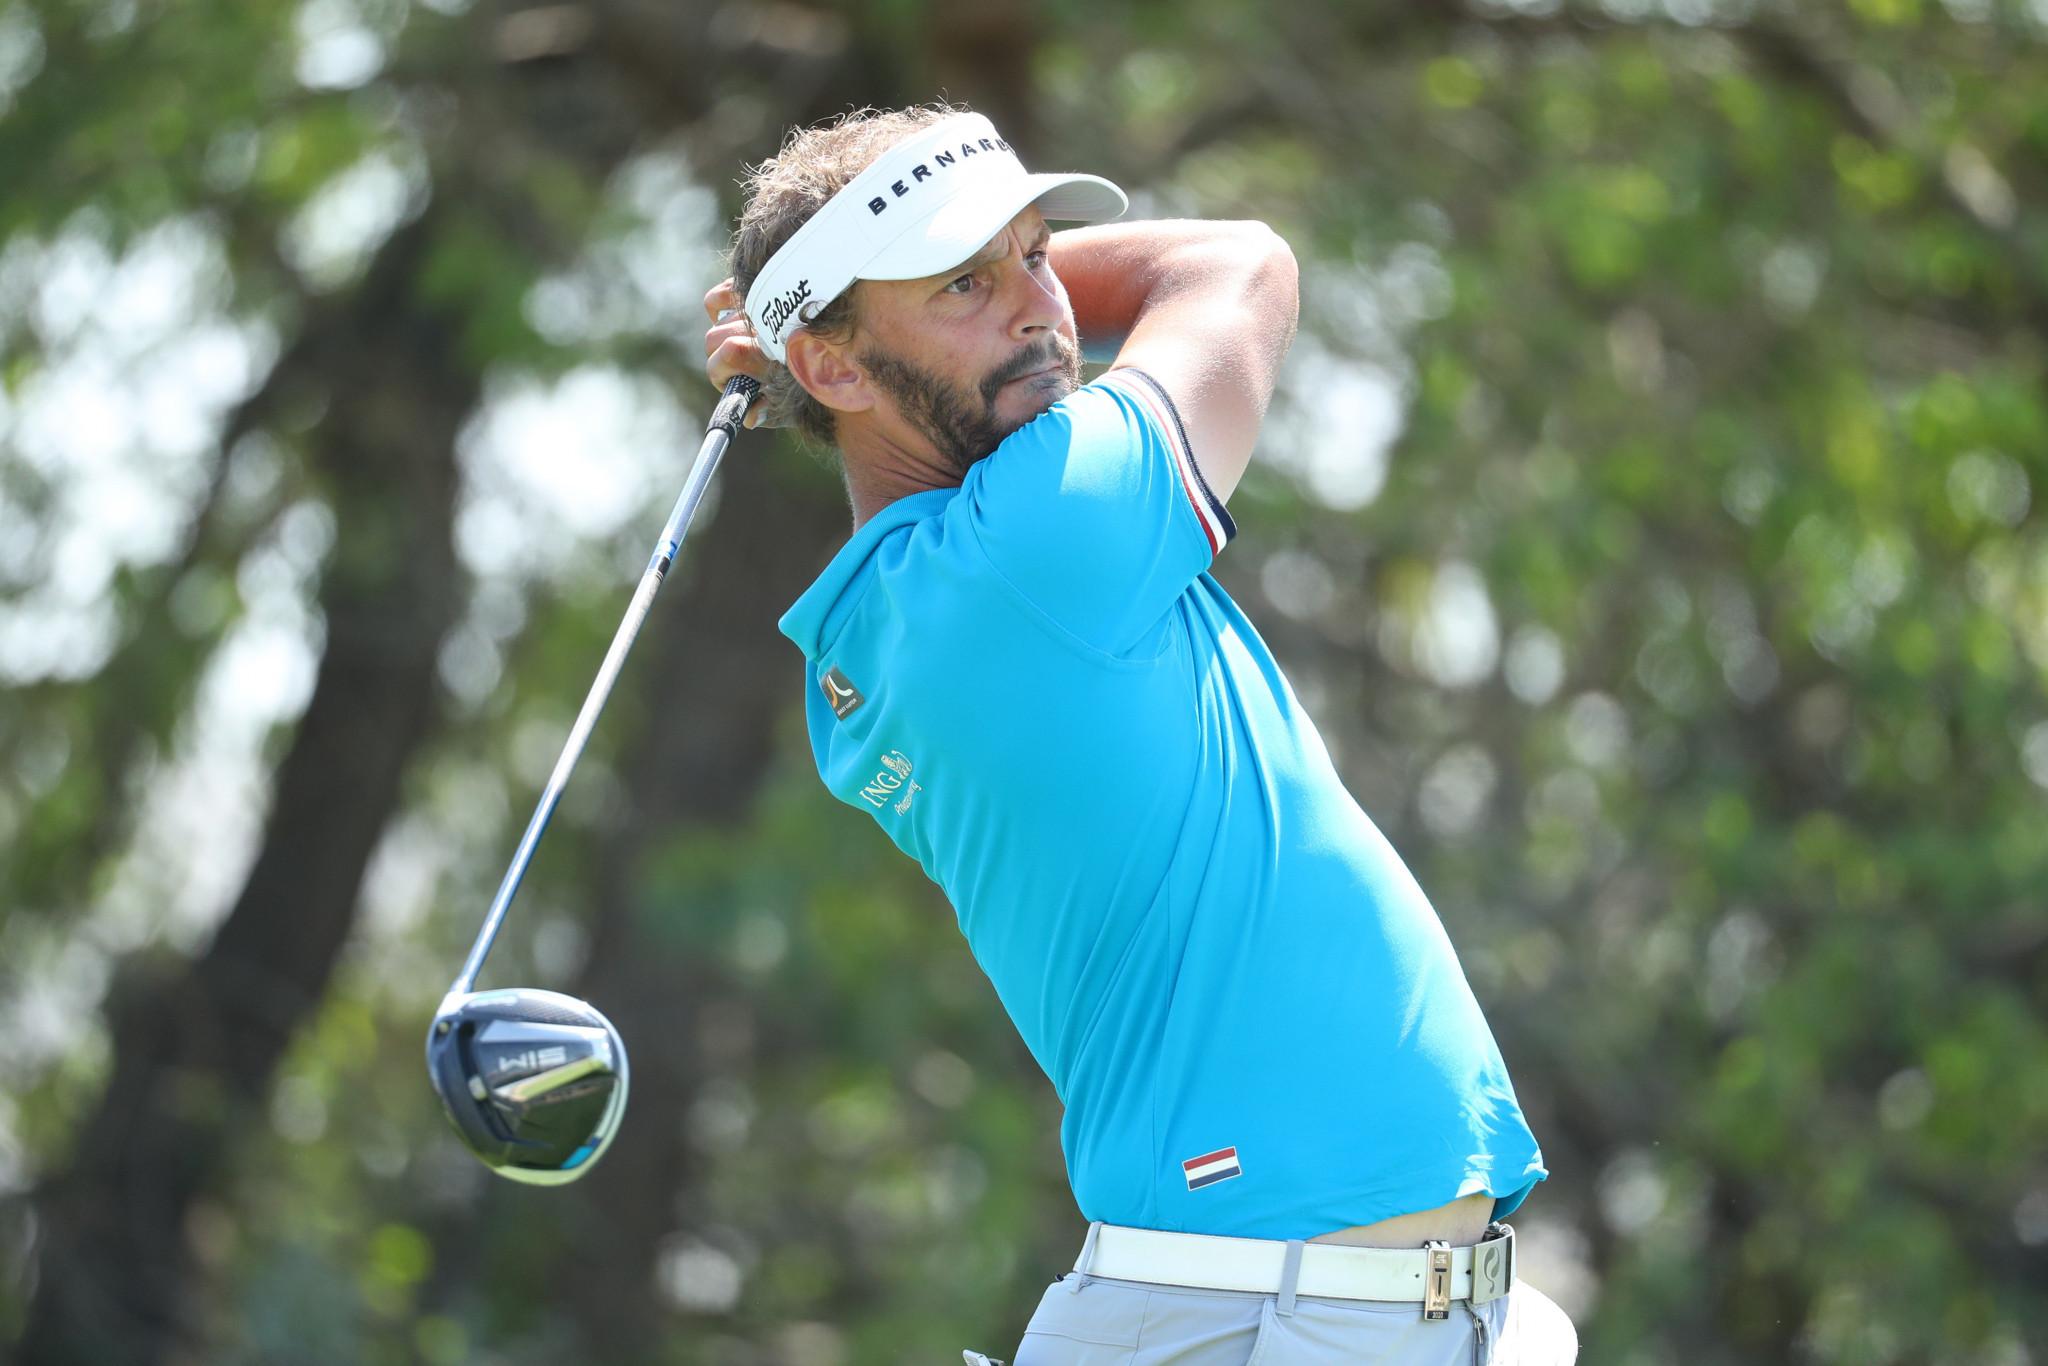 Dutchman Luiten wins first leg of European Tour's indoor golf series